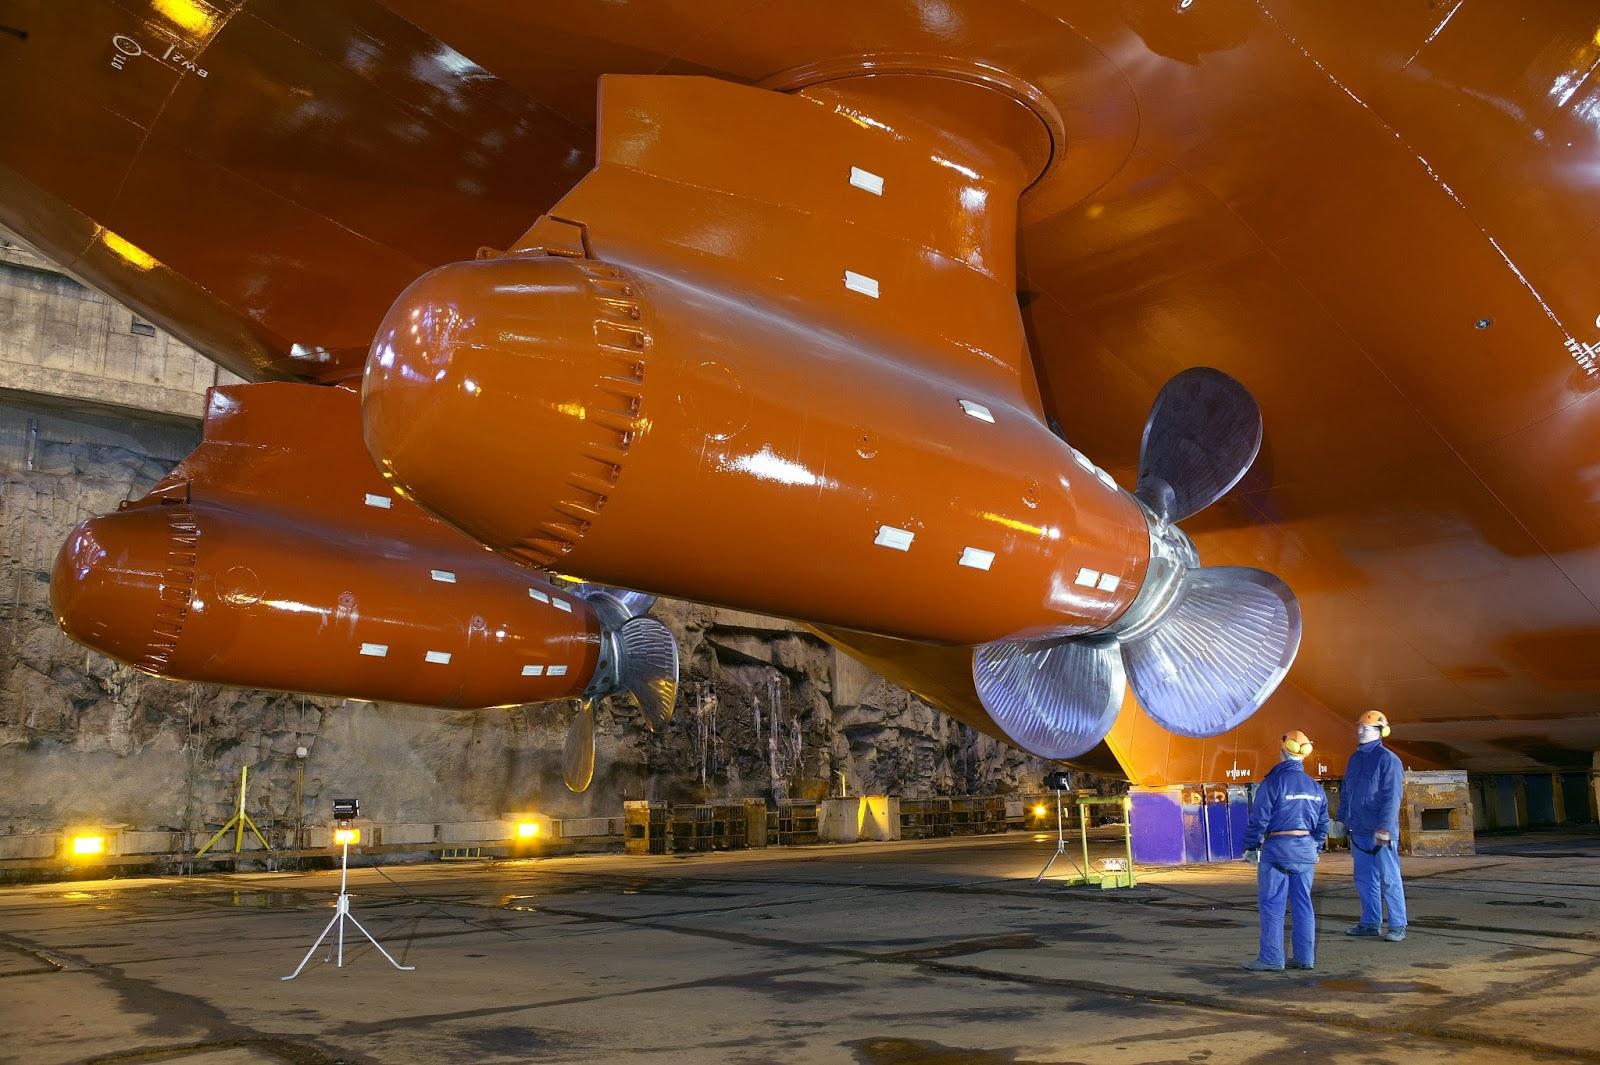 ABB - 25 milioni di dollari per due navi rompighiaccio russe